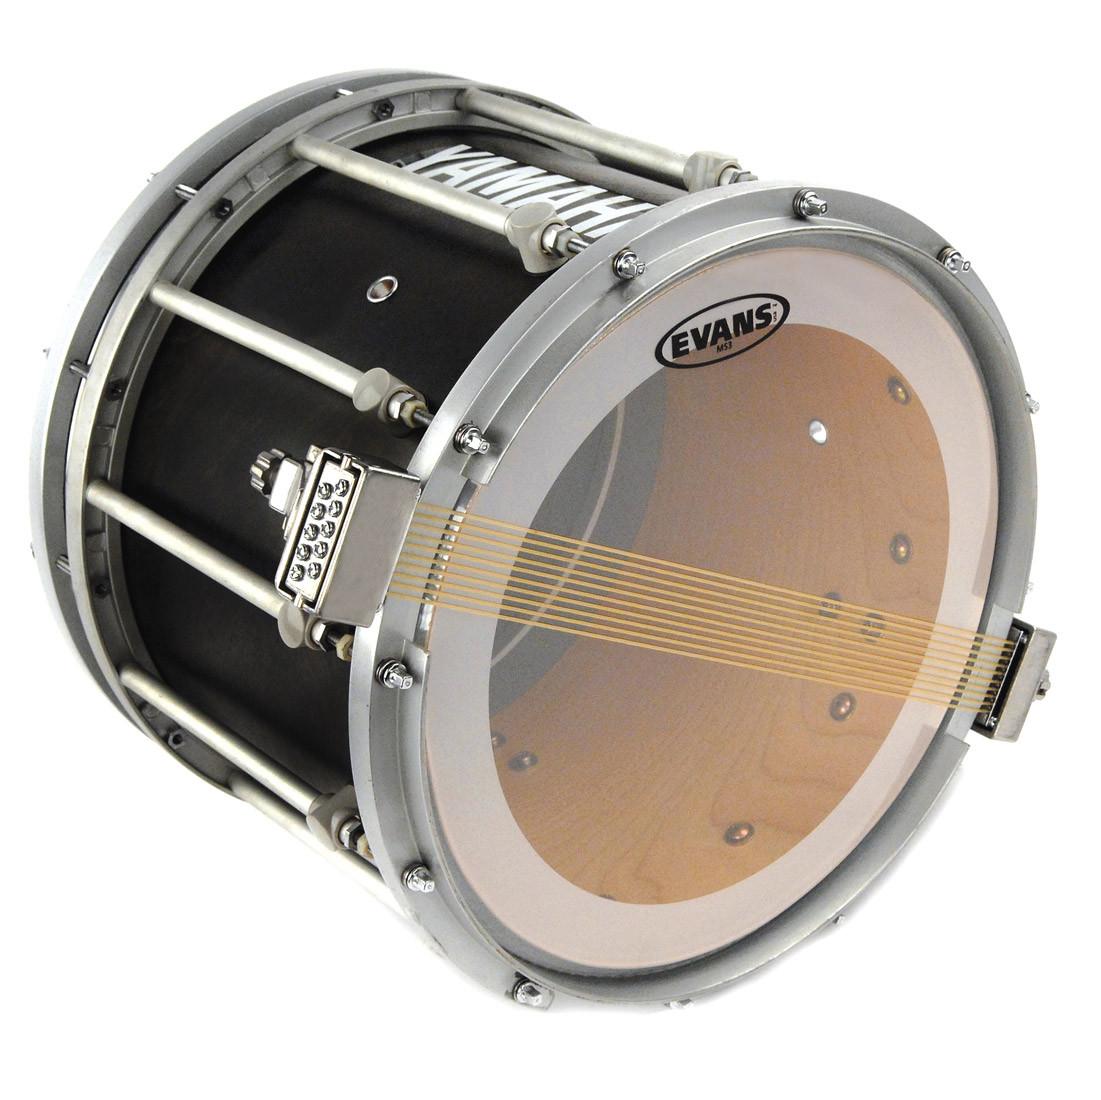 evans 13 ms3 marching drum snare side head clear drums on sale. Black Bedroom Furniture Sets. Home Design Ideas